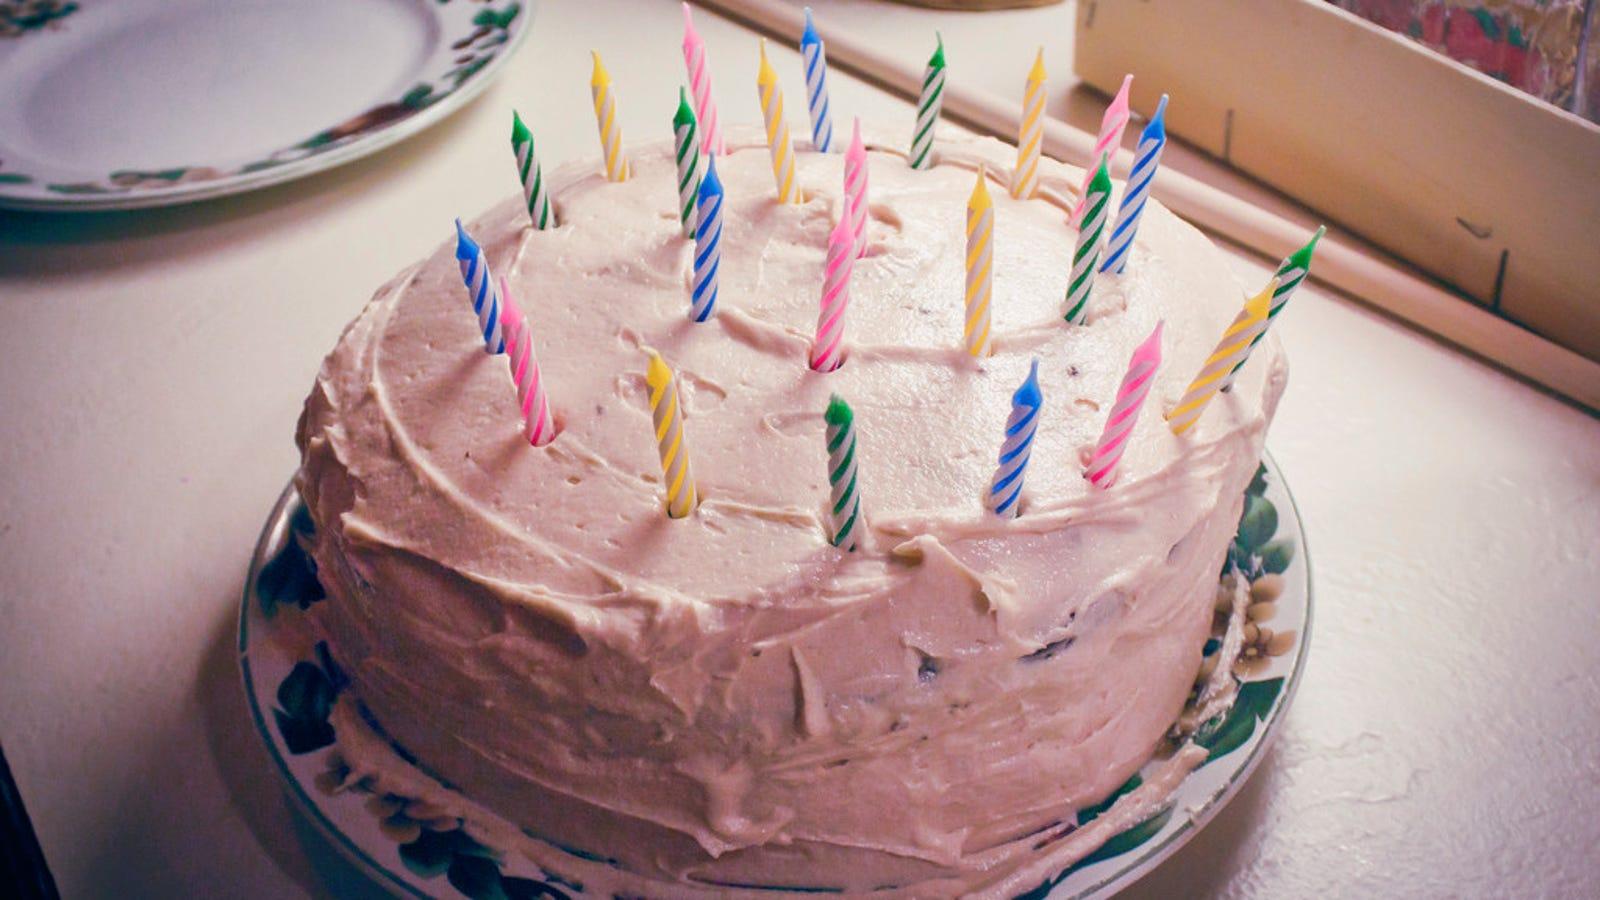 The Best Retail And Restaurant Birthday Freebies